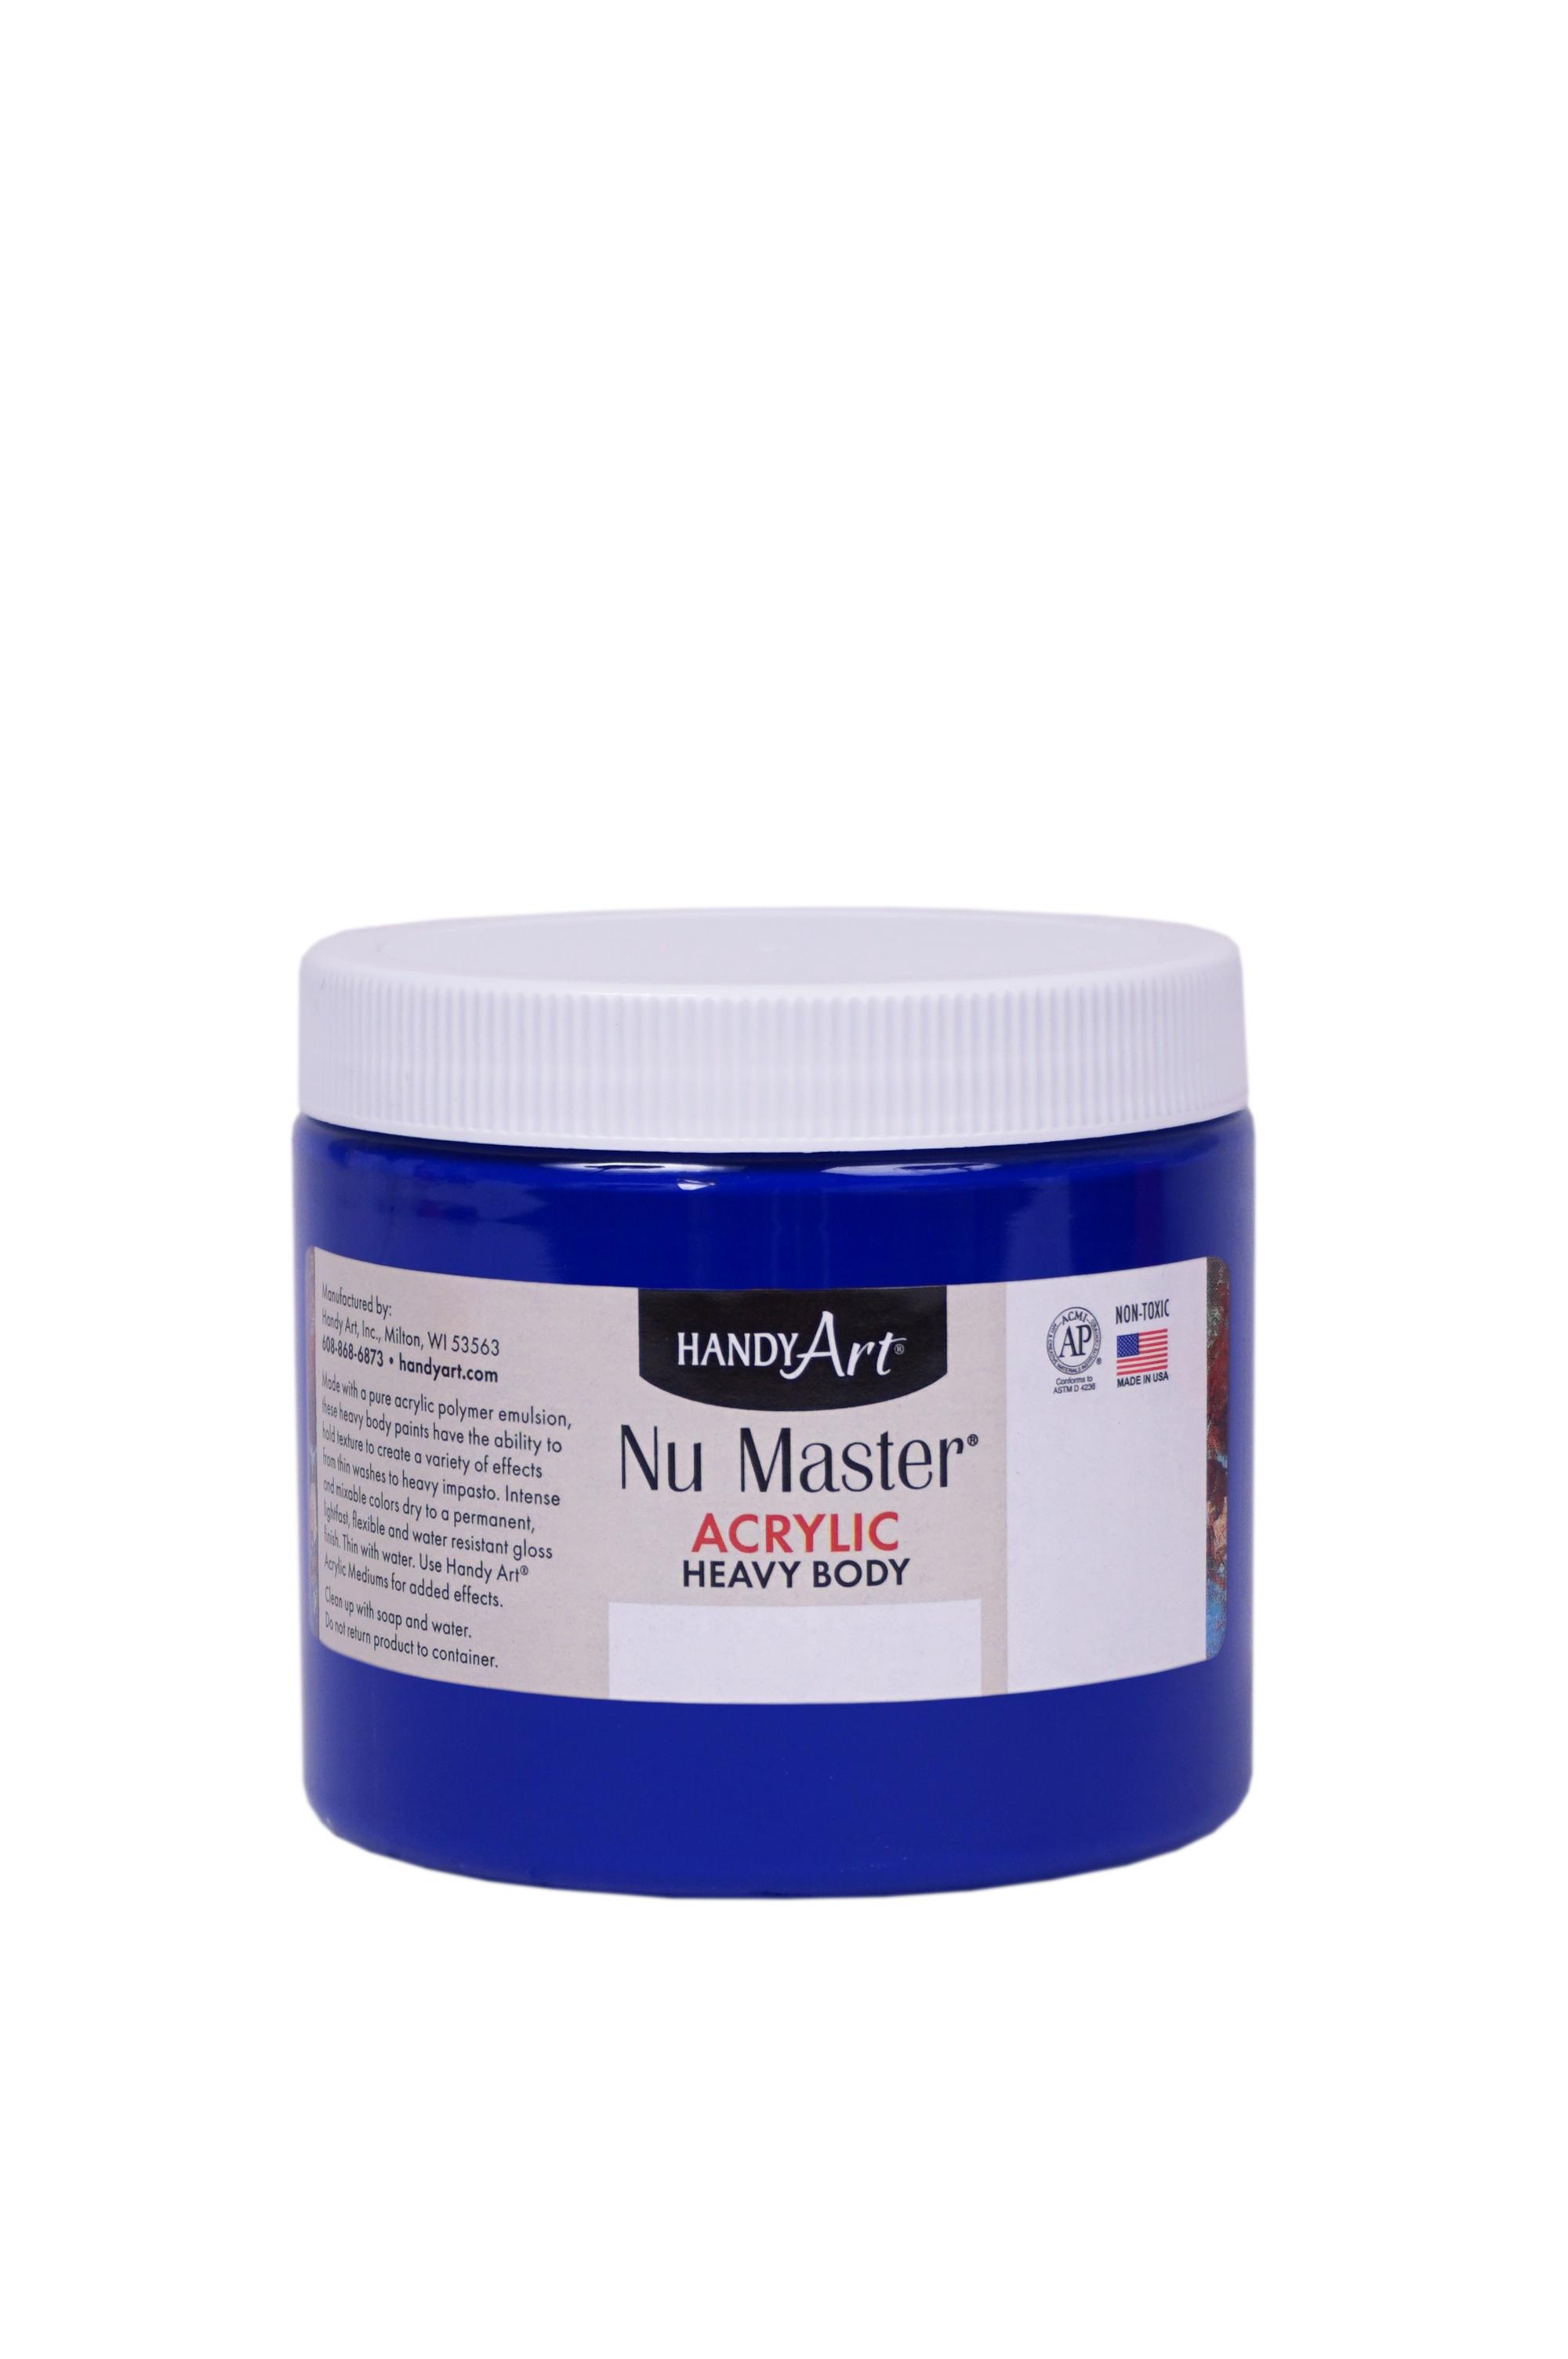 Handy Art 701065 Nu Master Heavy Body Acrylic Ultramarine Blue- 16 oz